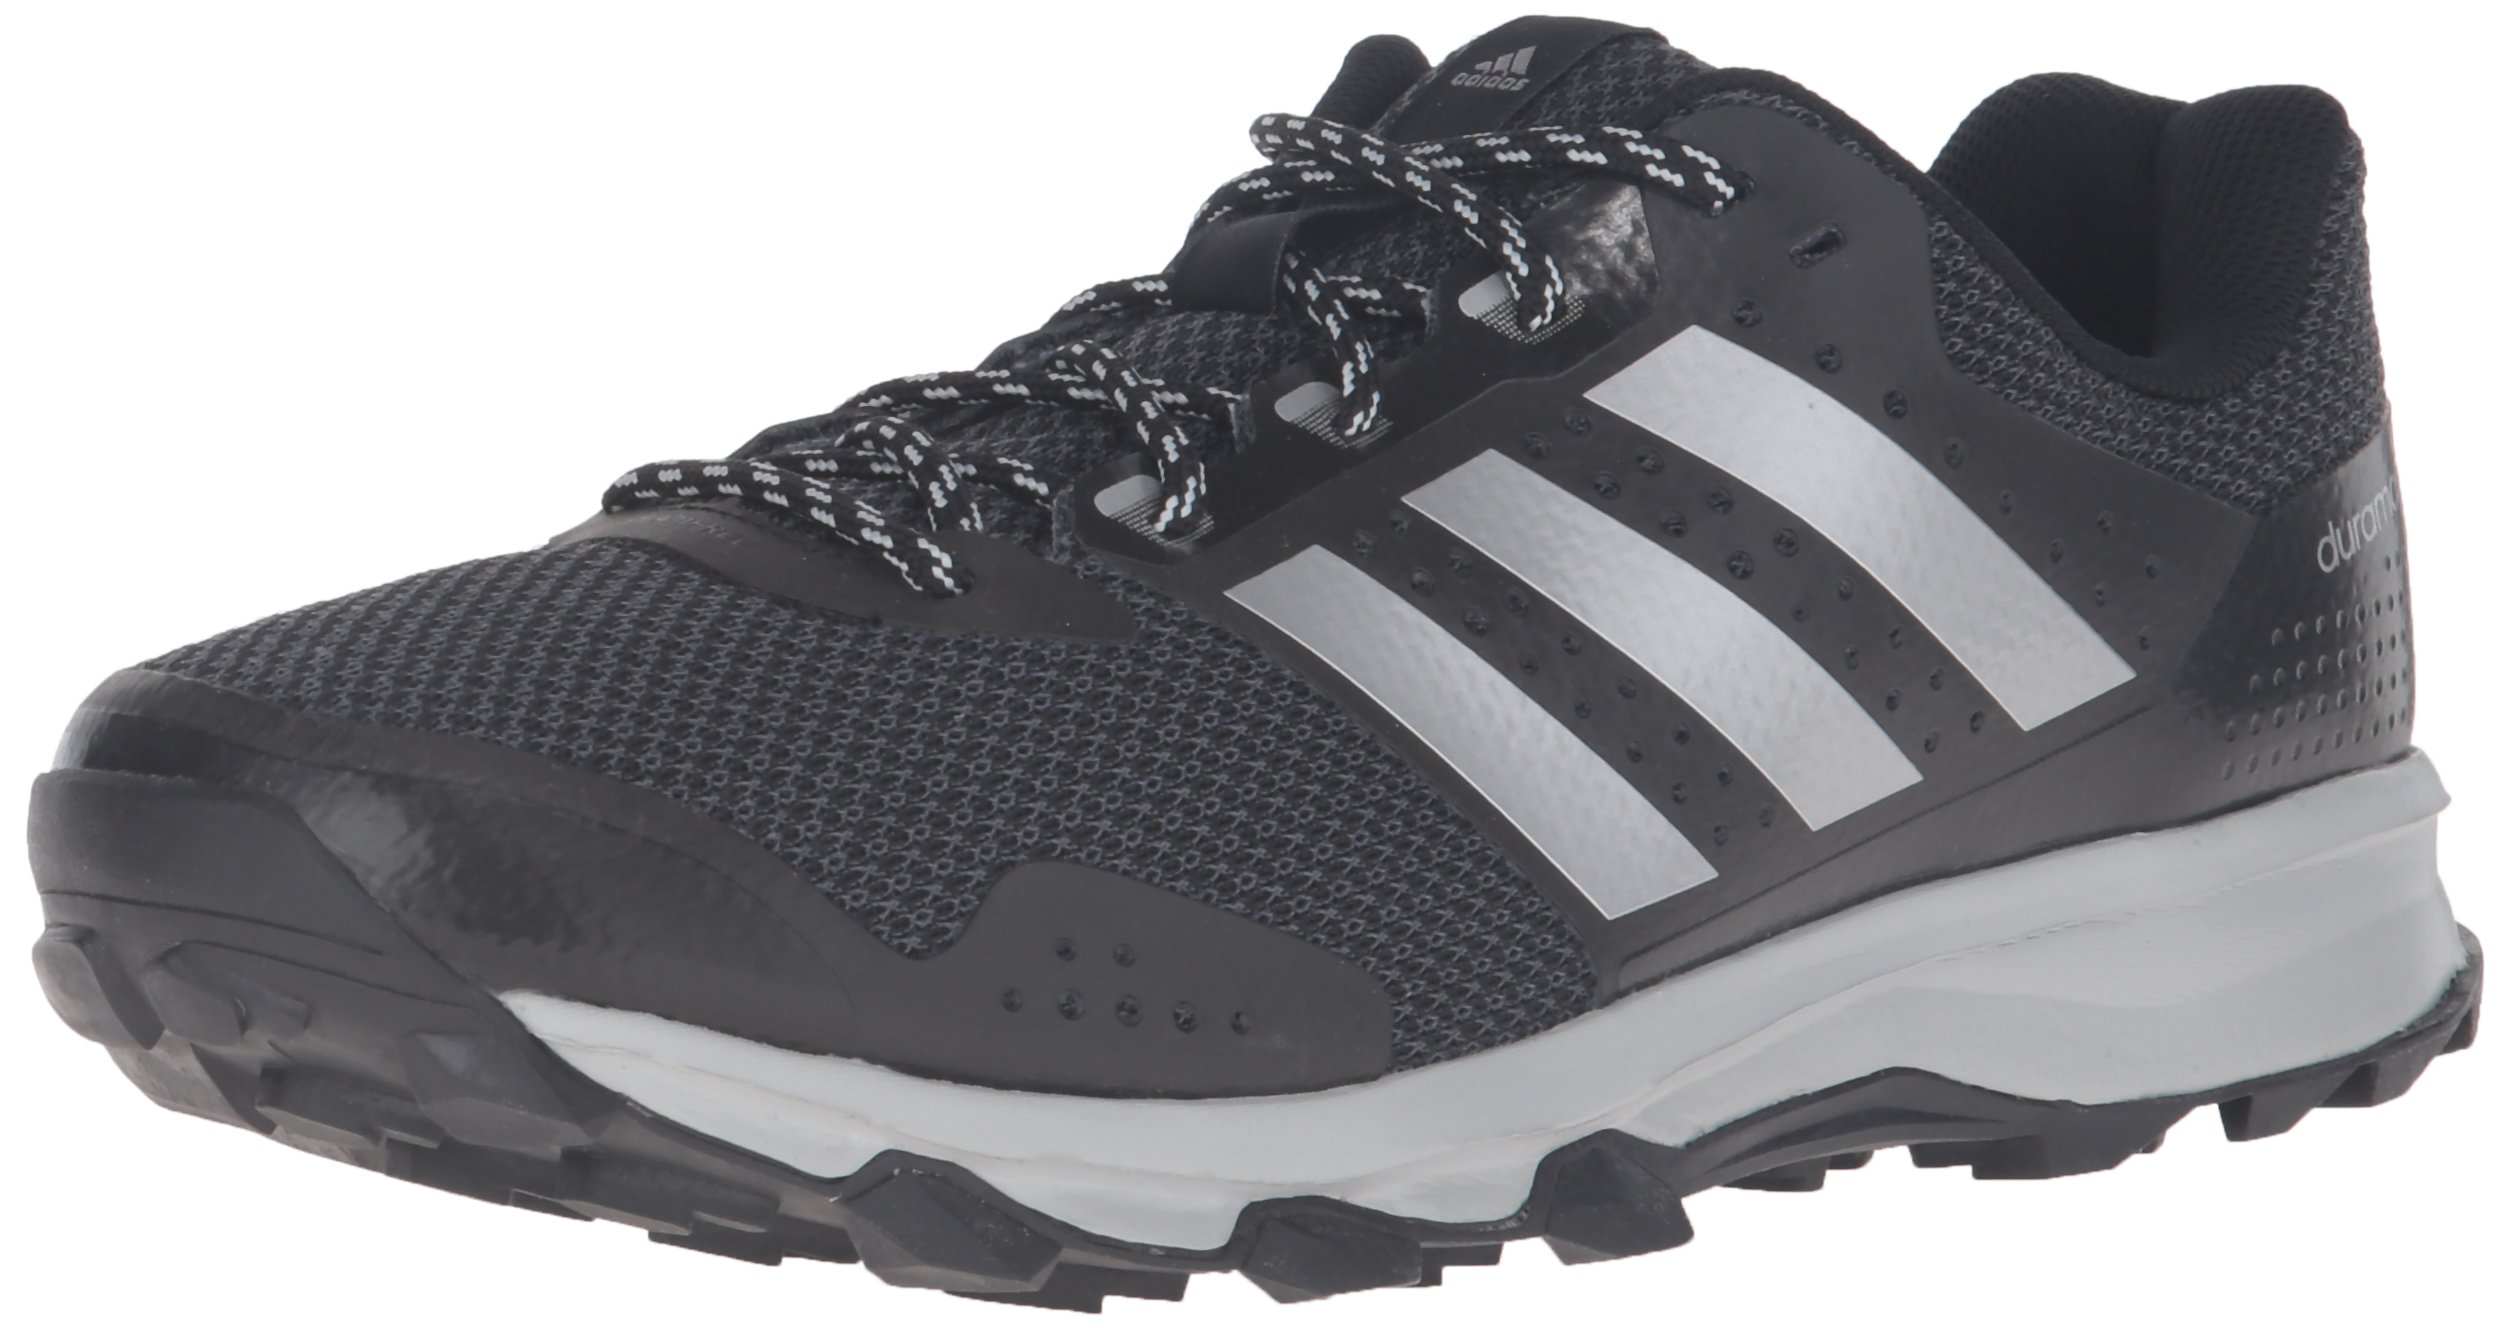 adidas Men's Duramo 7 m Trail Runner, Black/Metallic/Silver/Light Onix, 10 M US